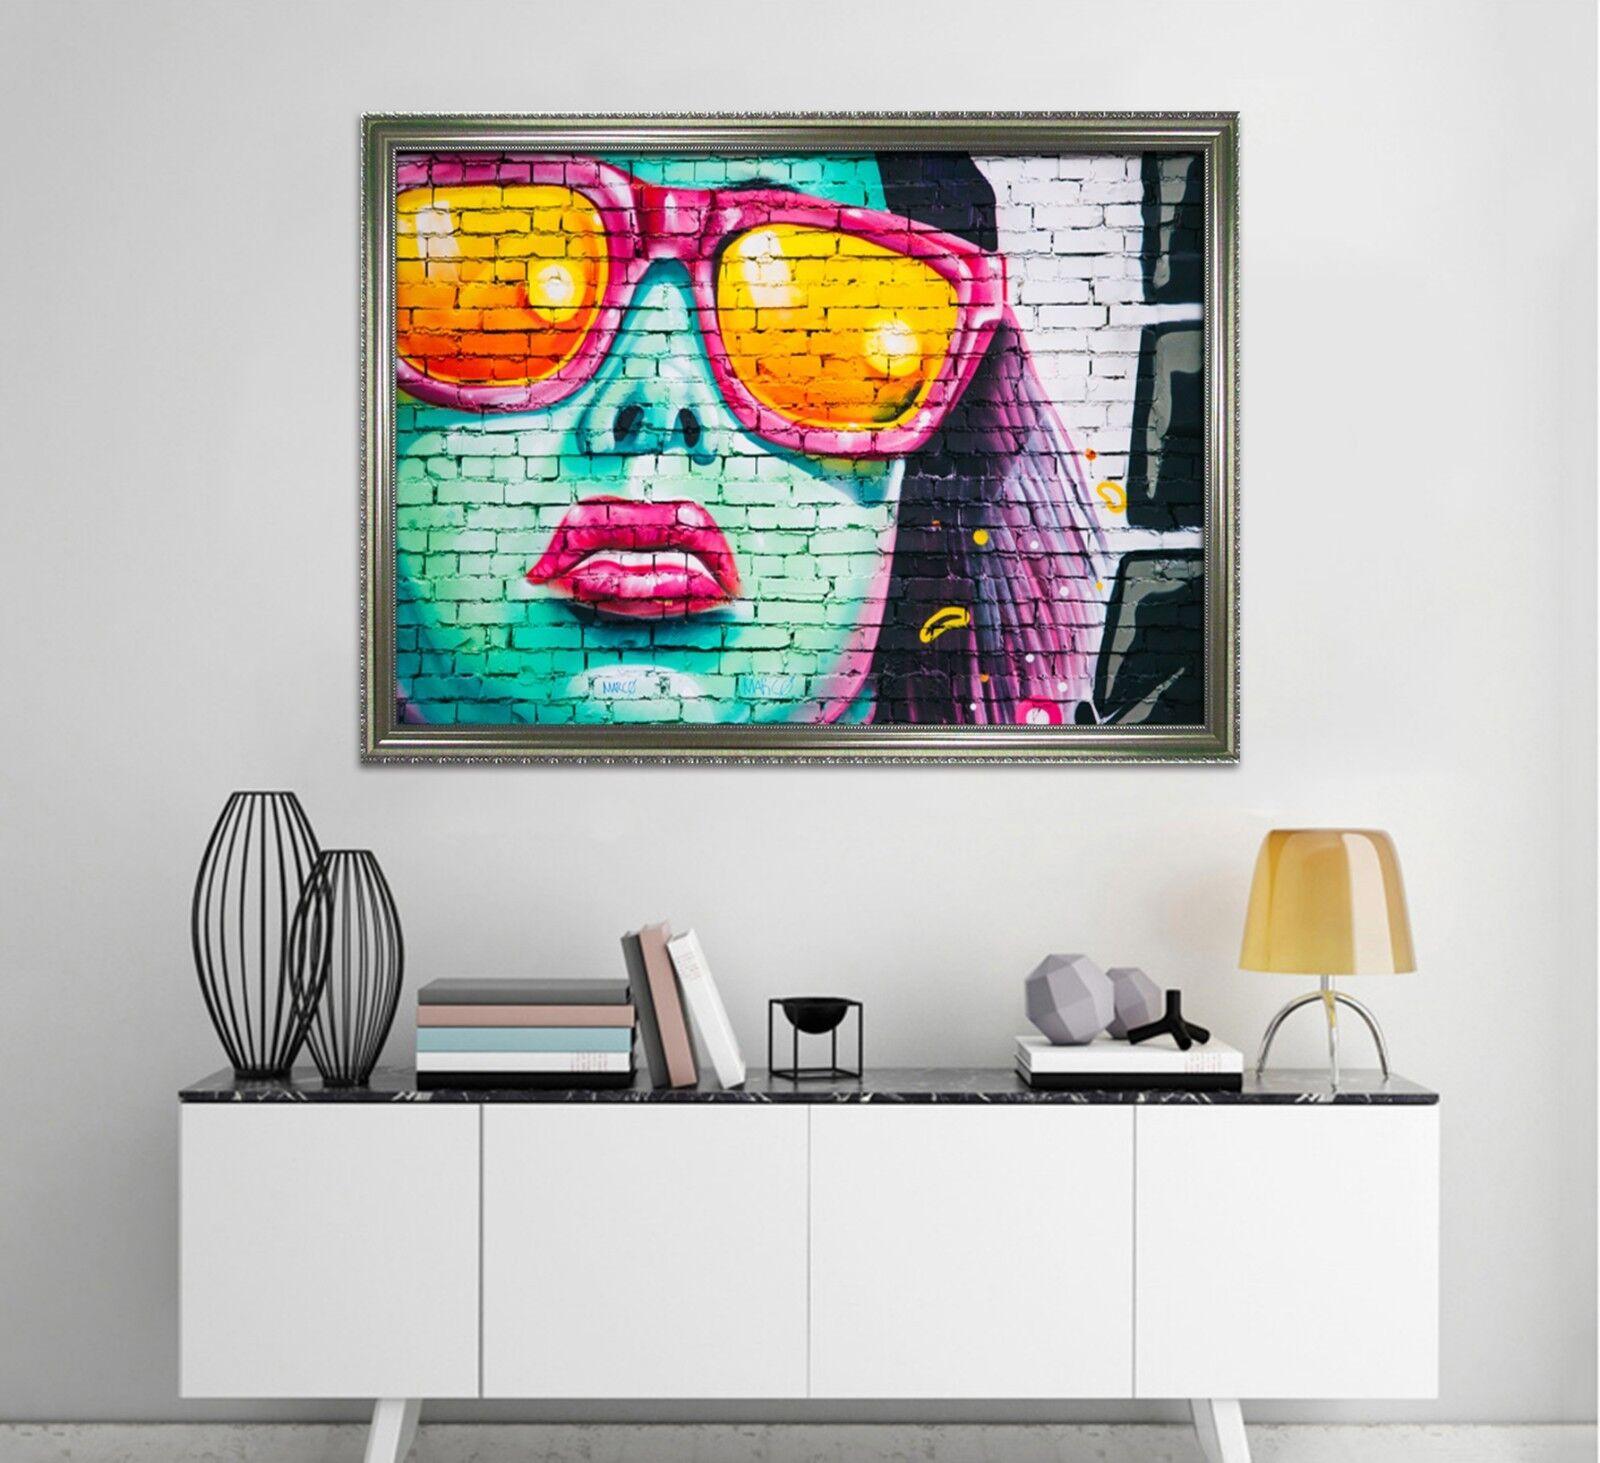 3D Wall Sunglasses Girl 3 Framed Poster Home Decor Print Painting Art WALLPAPER